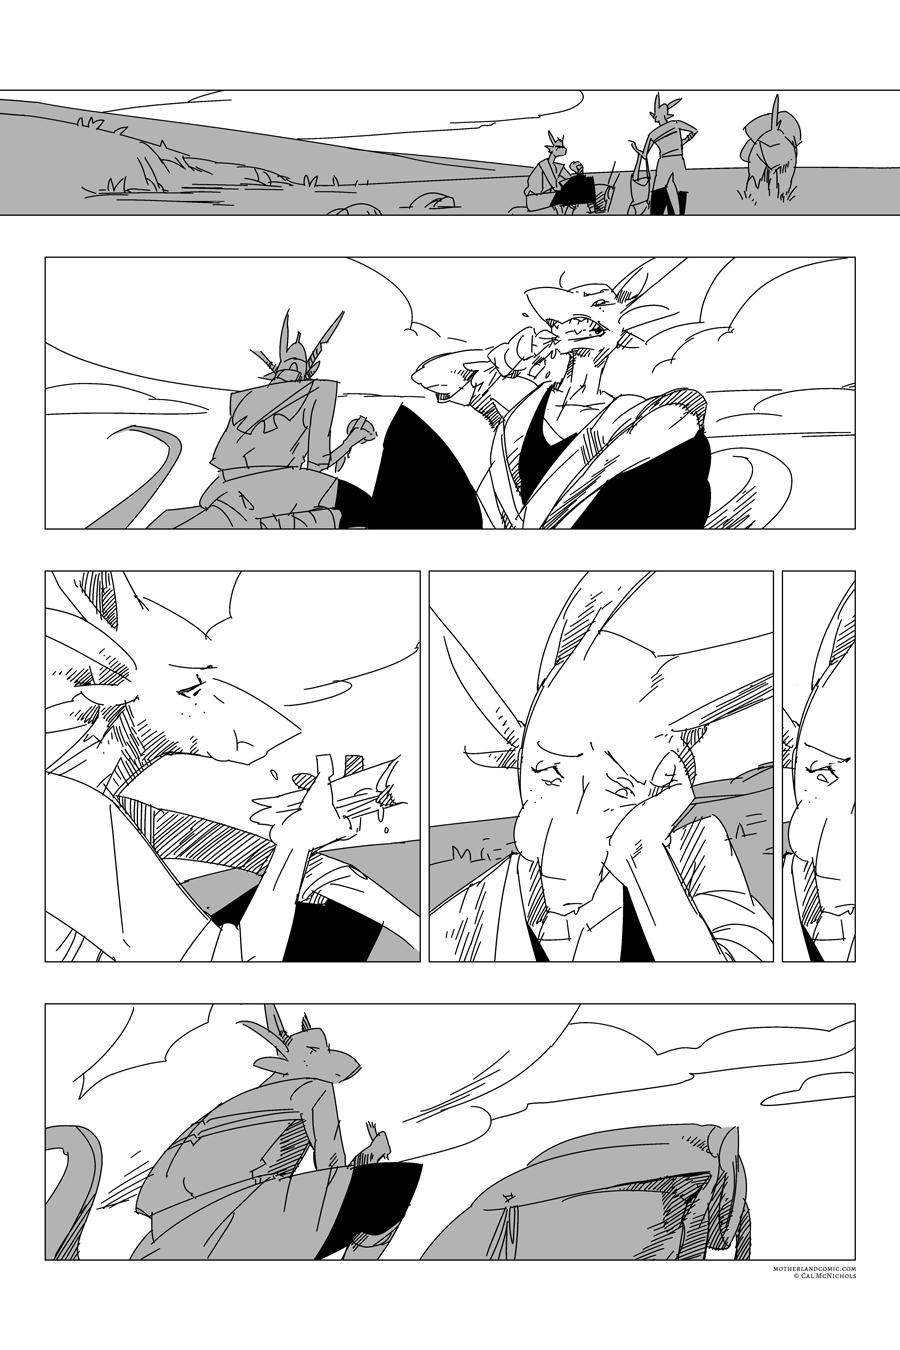 pg 88